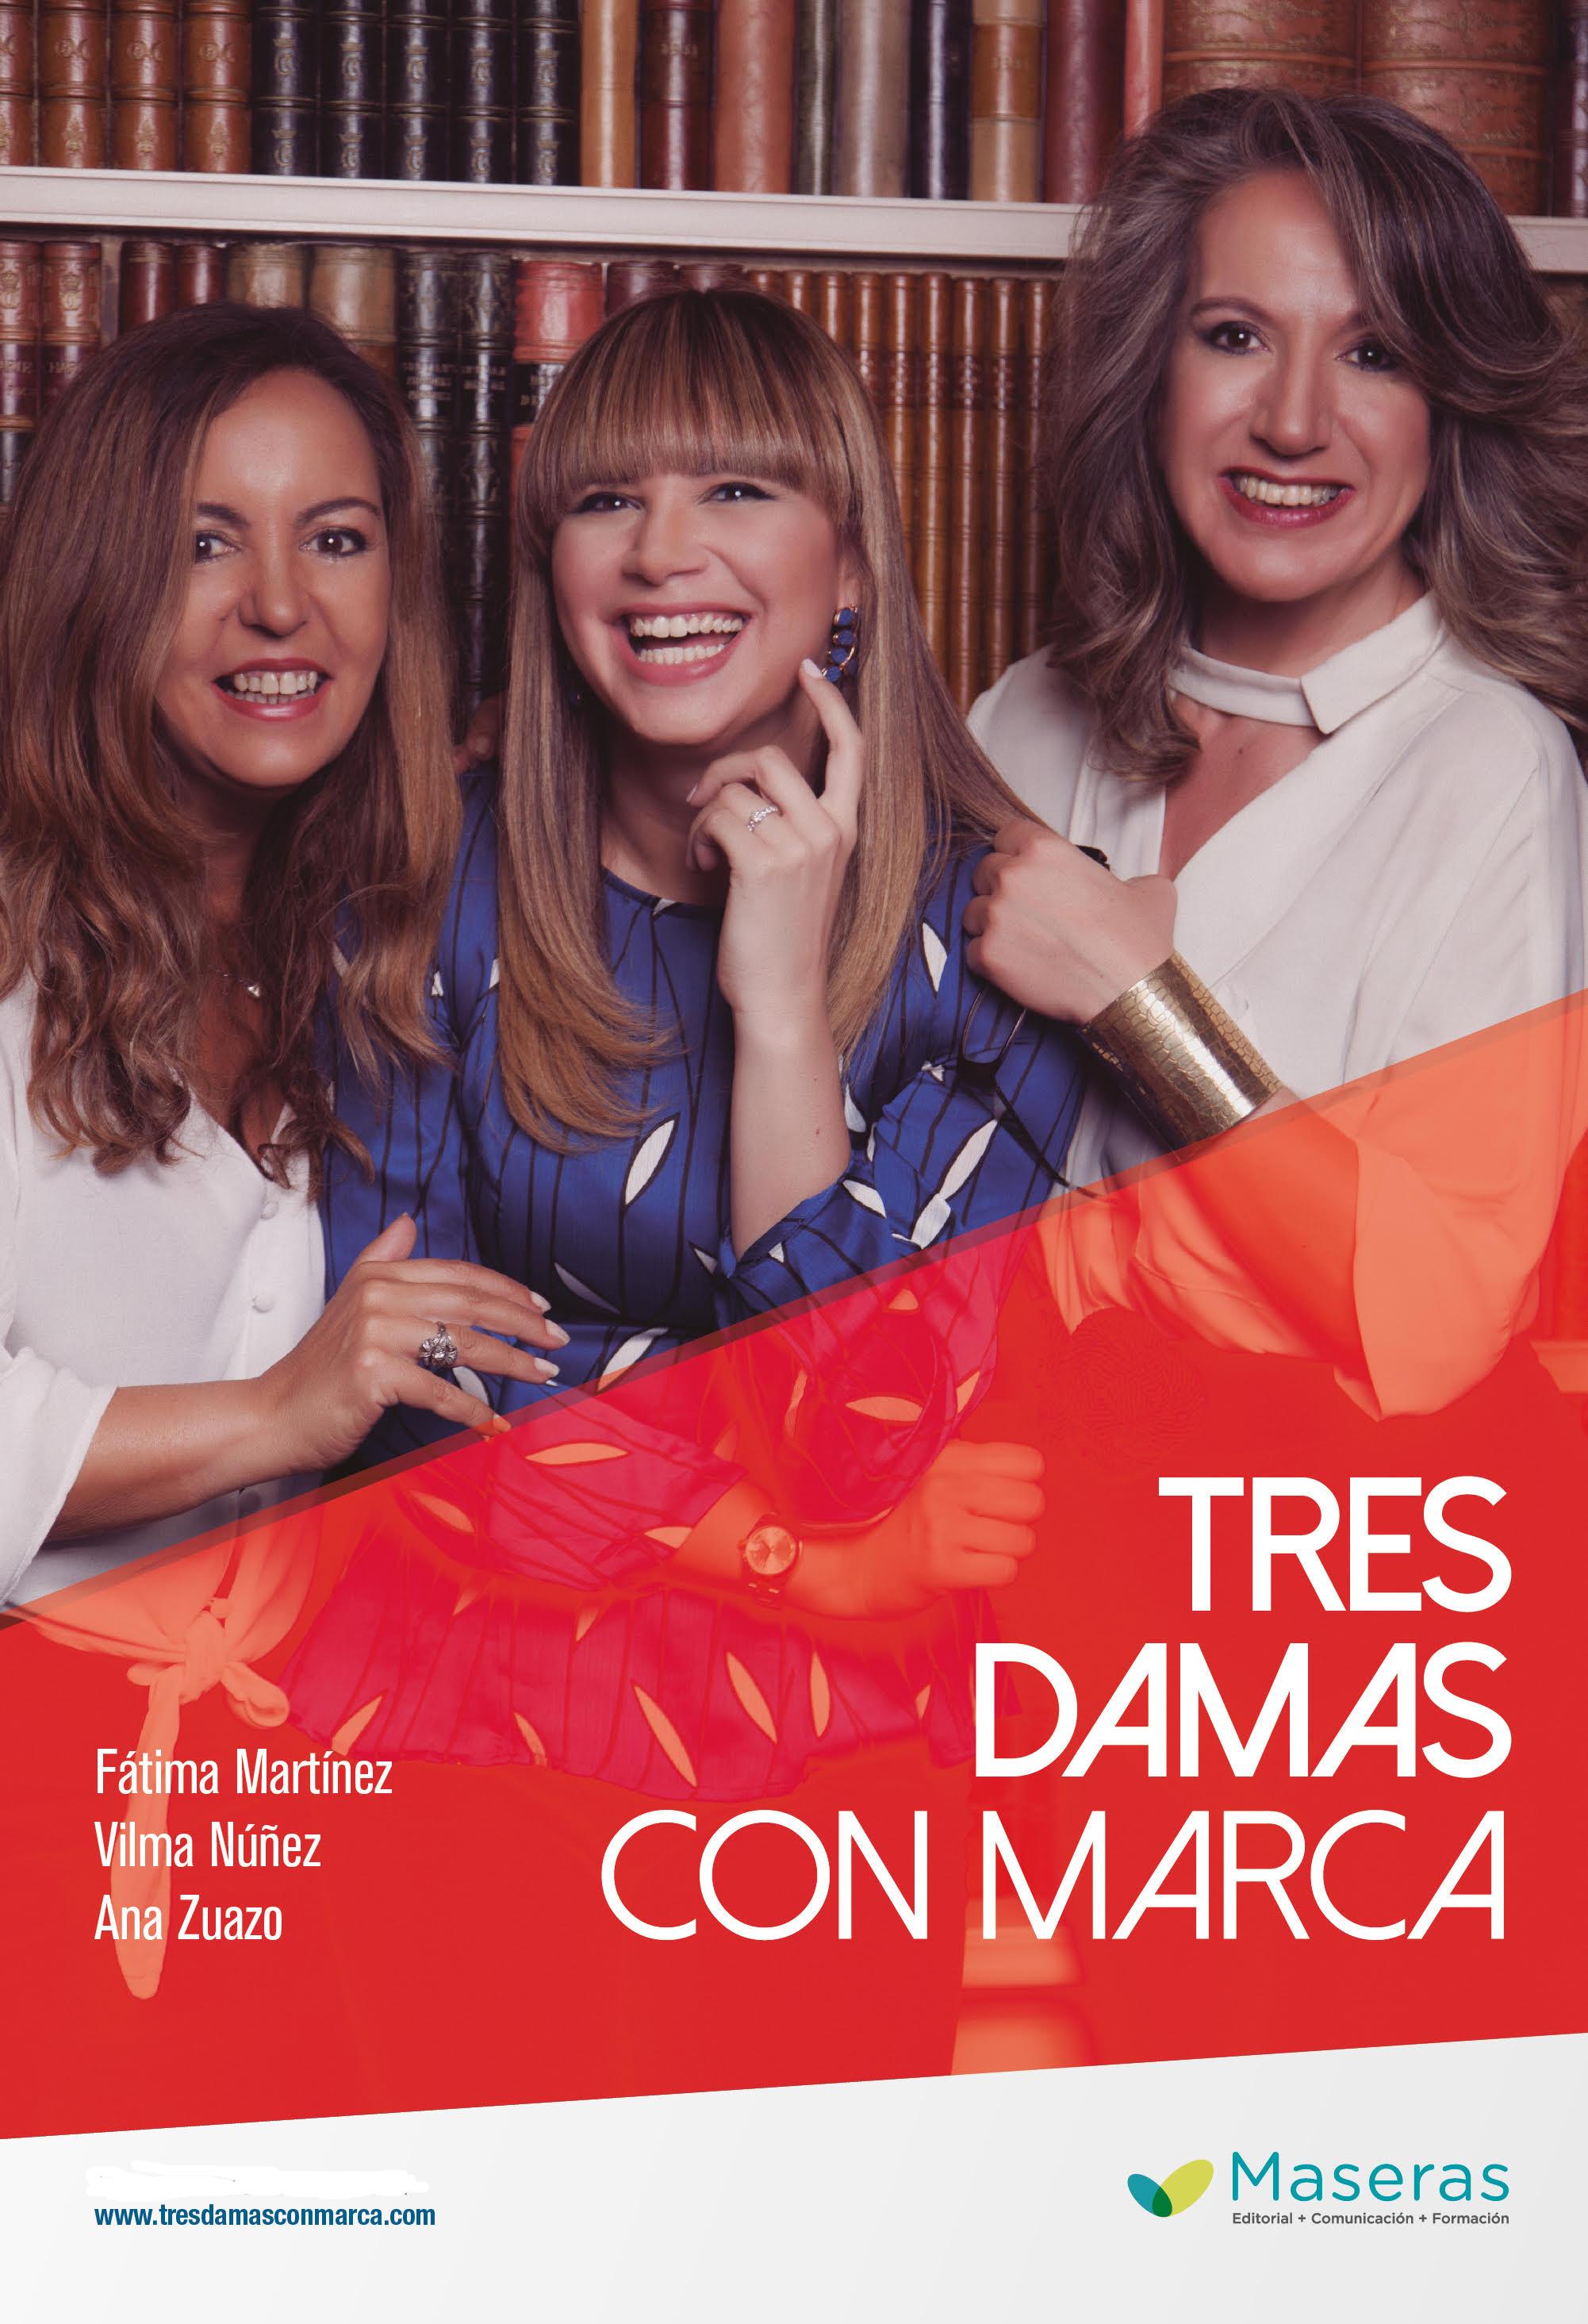 Tres Damas con Marca